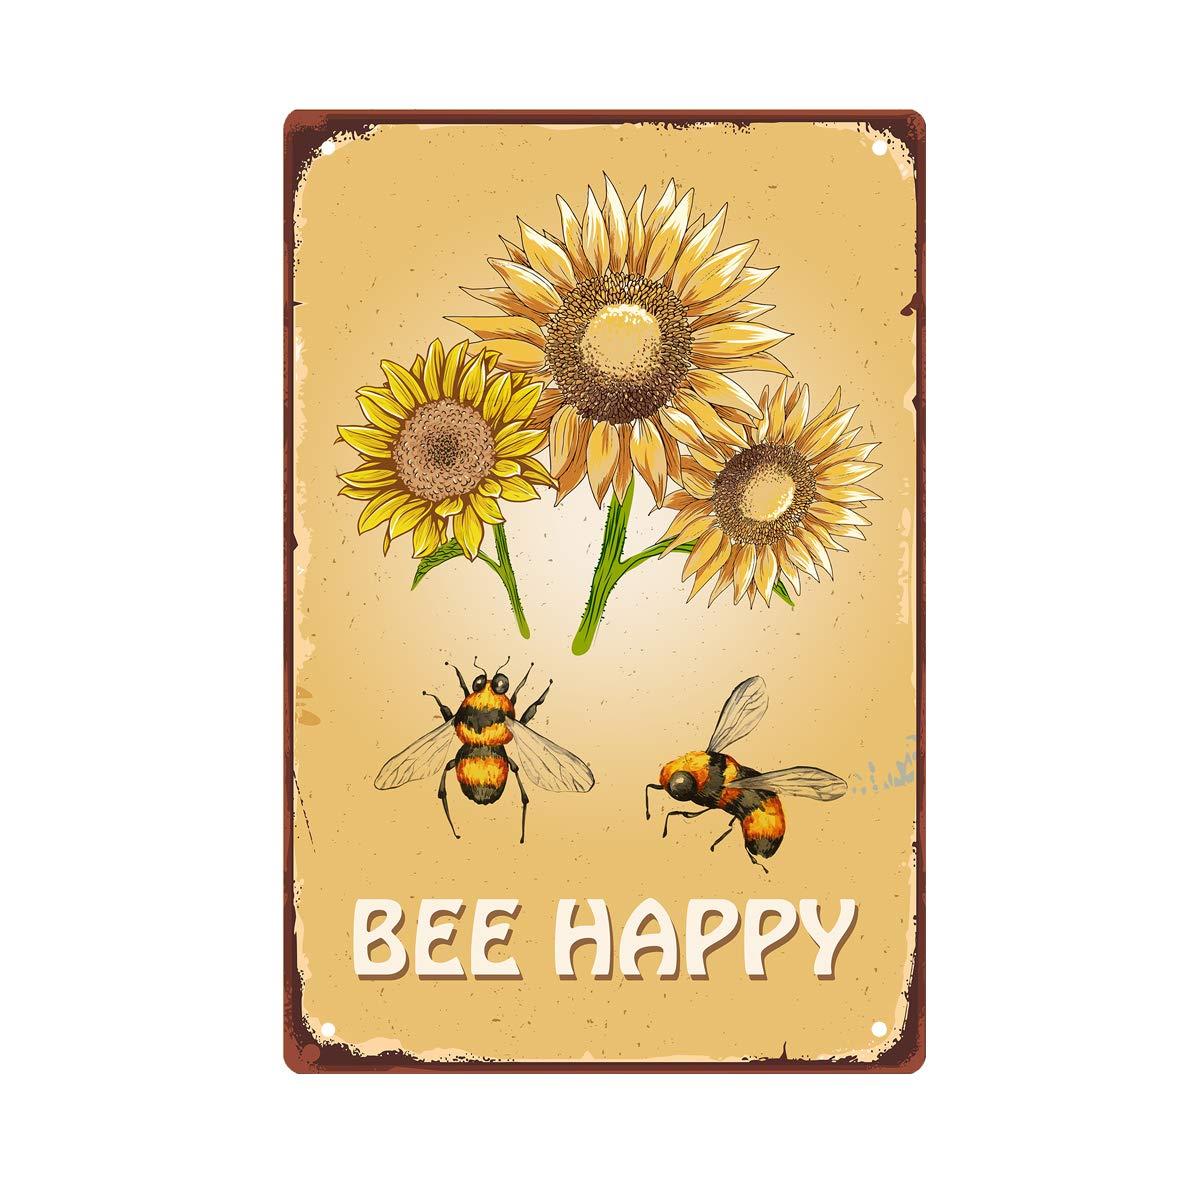 Letrero de Metal feliz párr de pared de abeja tallada 8x12 pulgadas